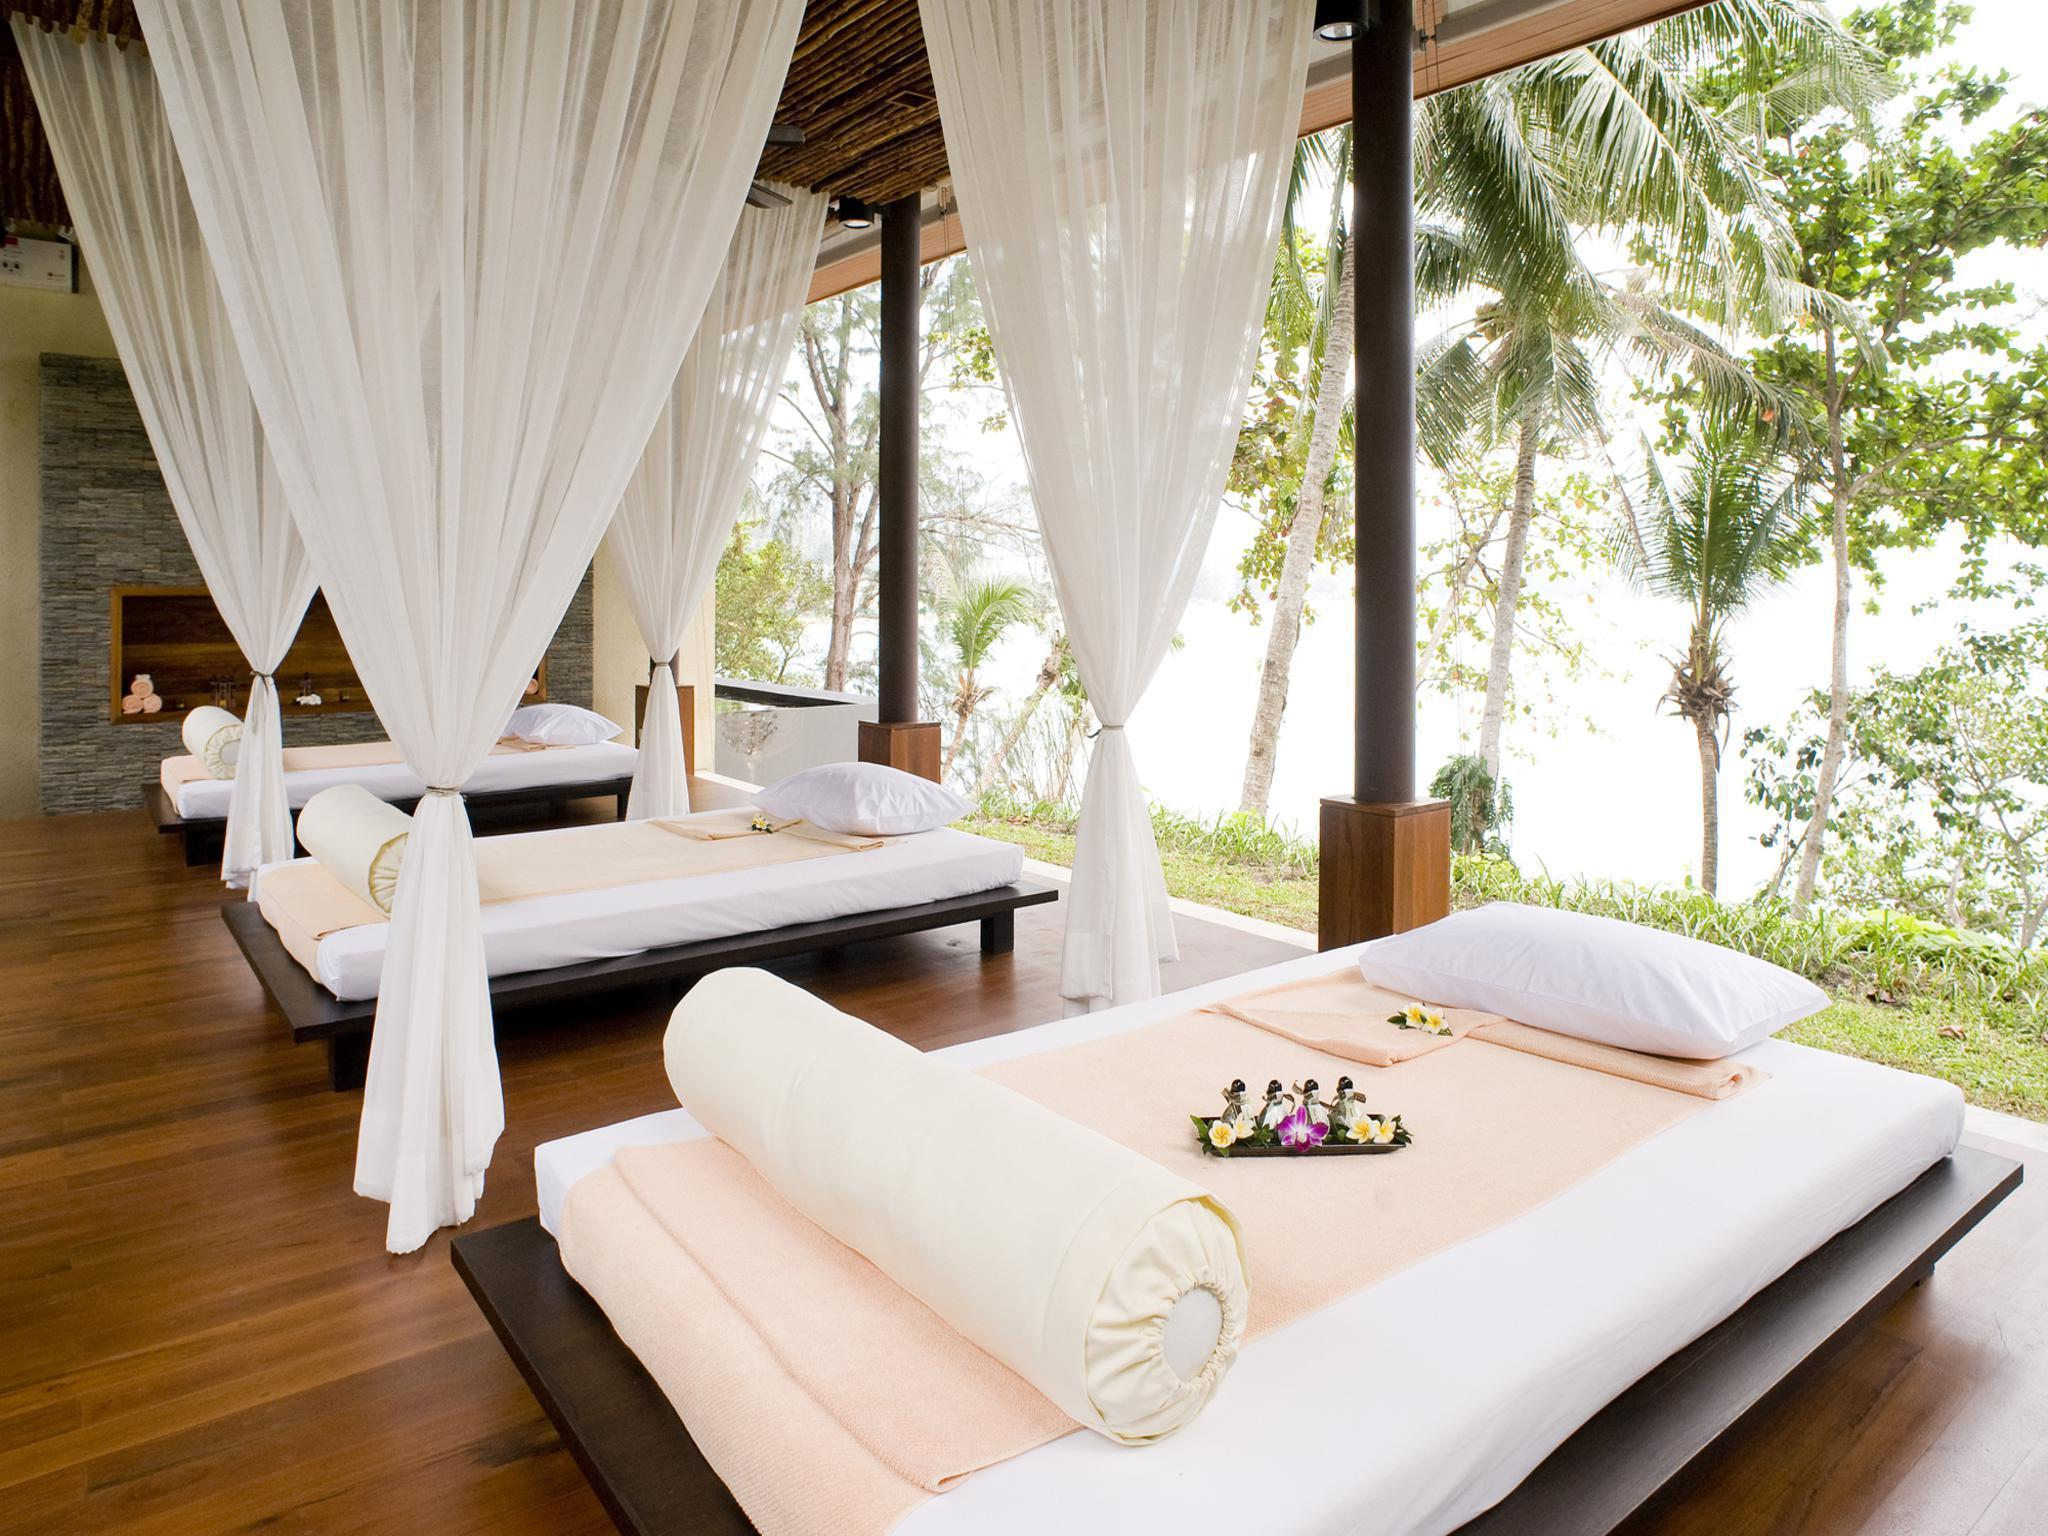 Centara Villas Phuket Hotel โรงแรมเซ็นทารา วิลลา ภูเก็ต